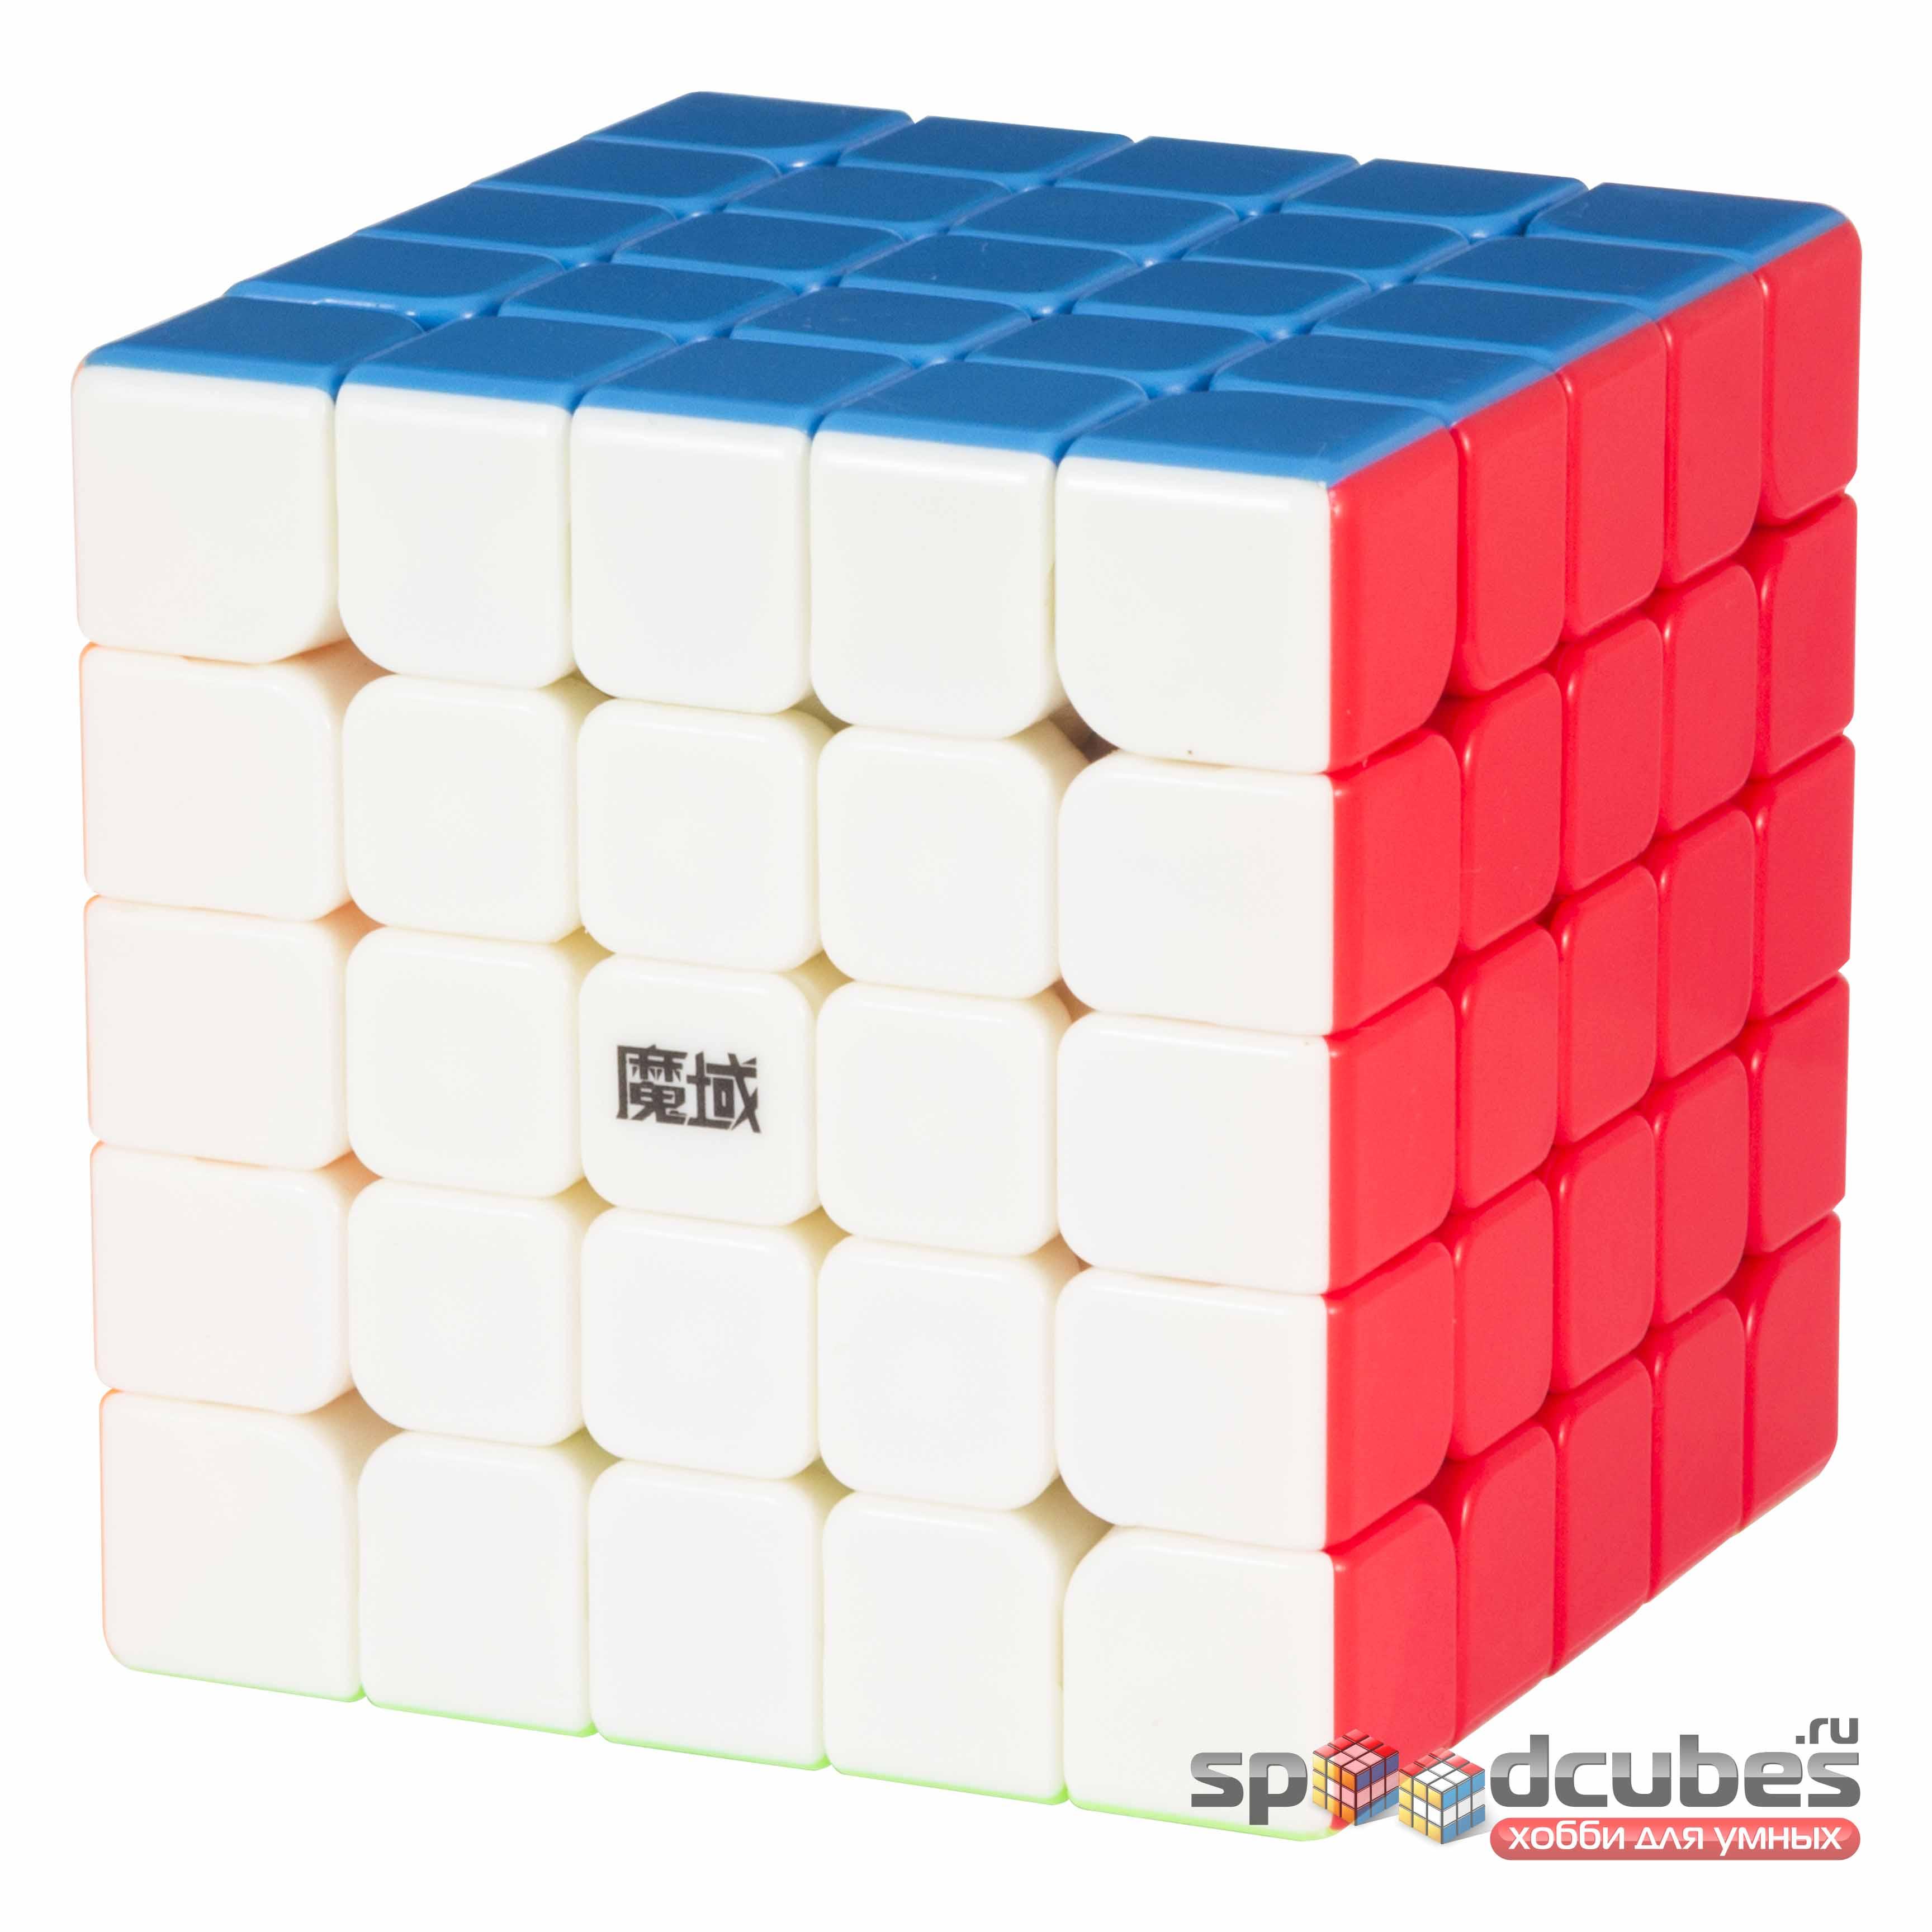 MoYu 5x5x5 Weichuang GTS Color 2